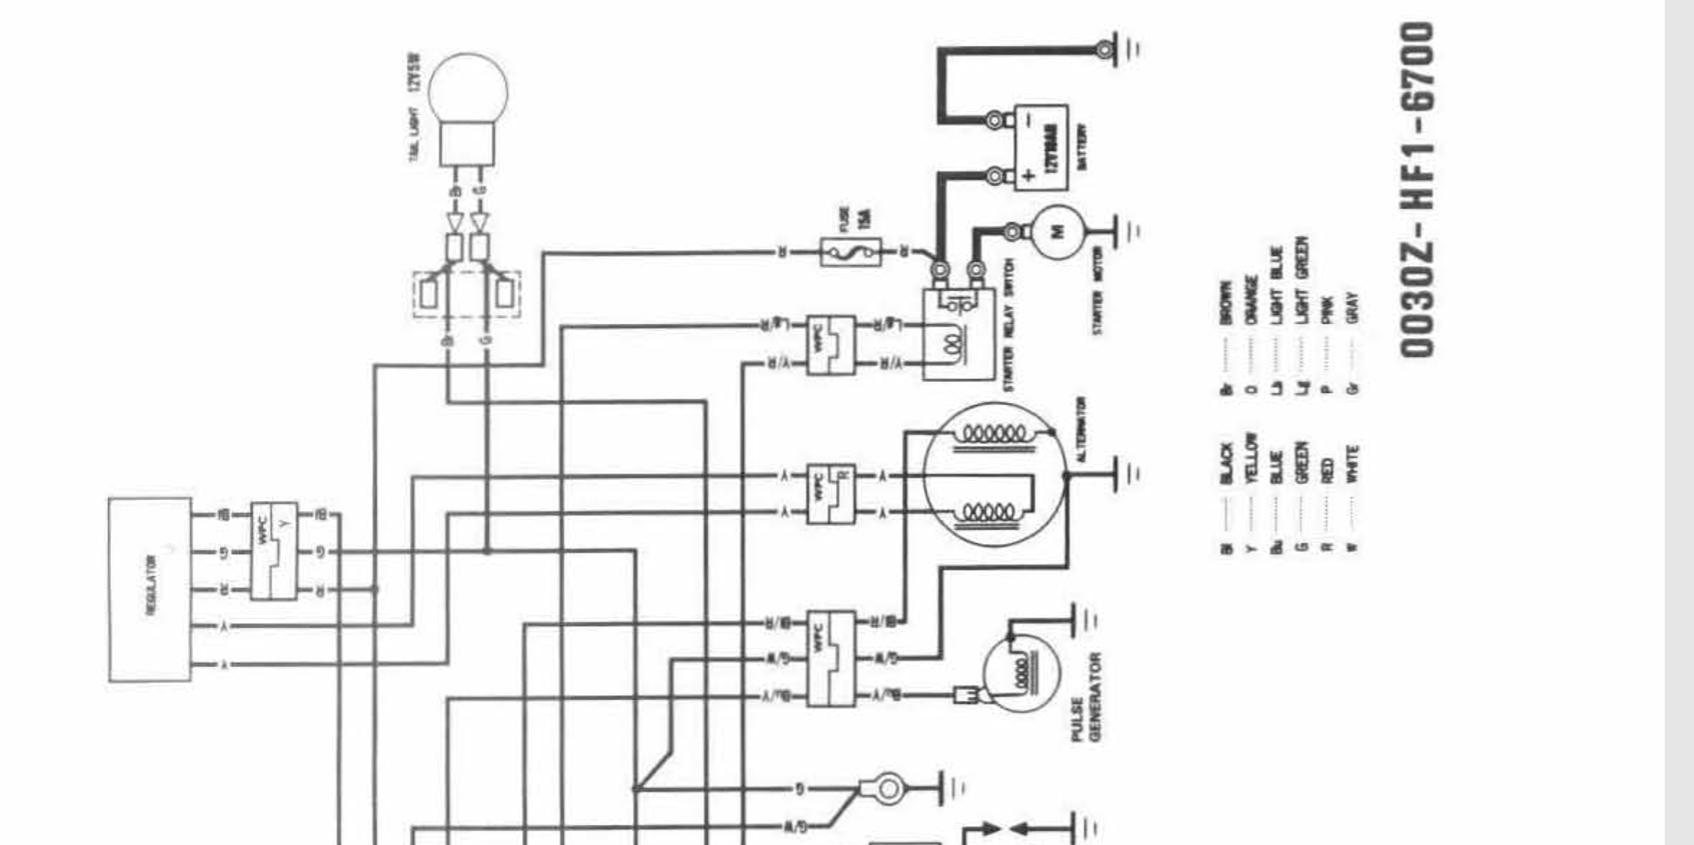 hight resolution of honda fourtrax trx200d type ii problem s honda atv forum wiring diagram for 1995 honda fourtrax